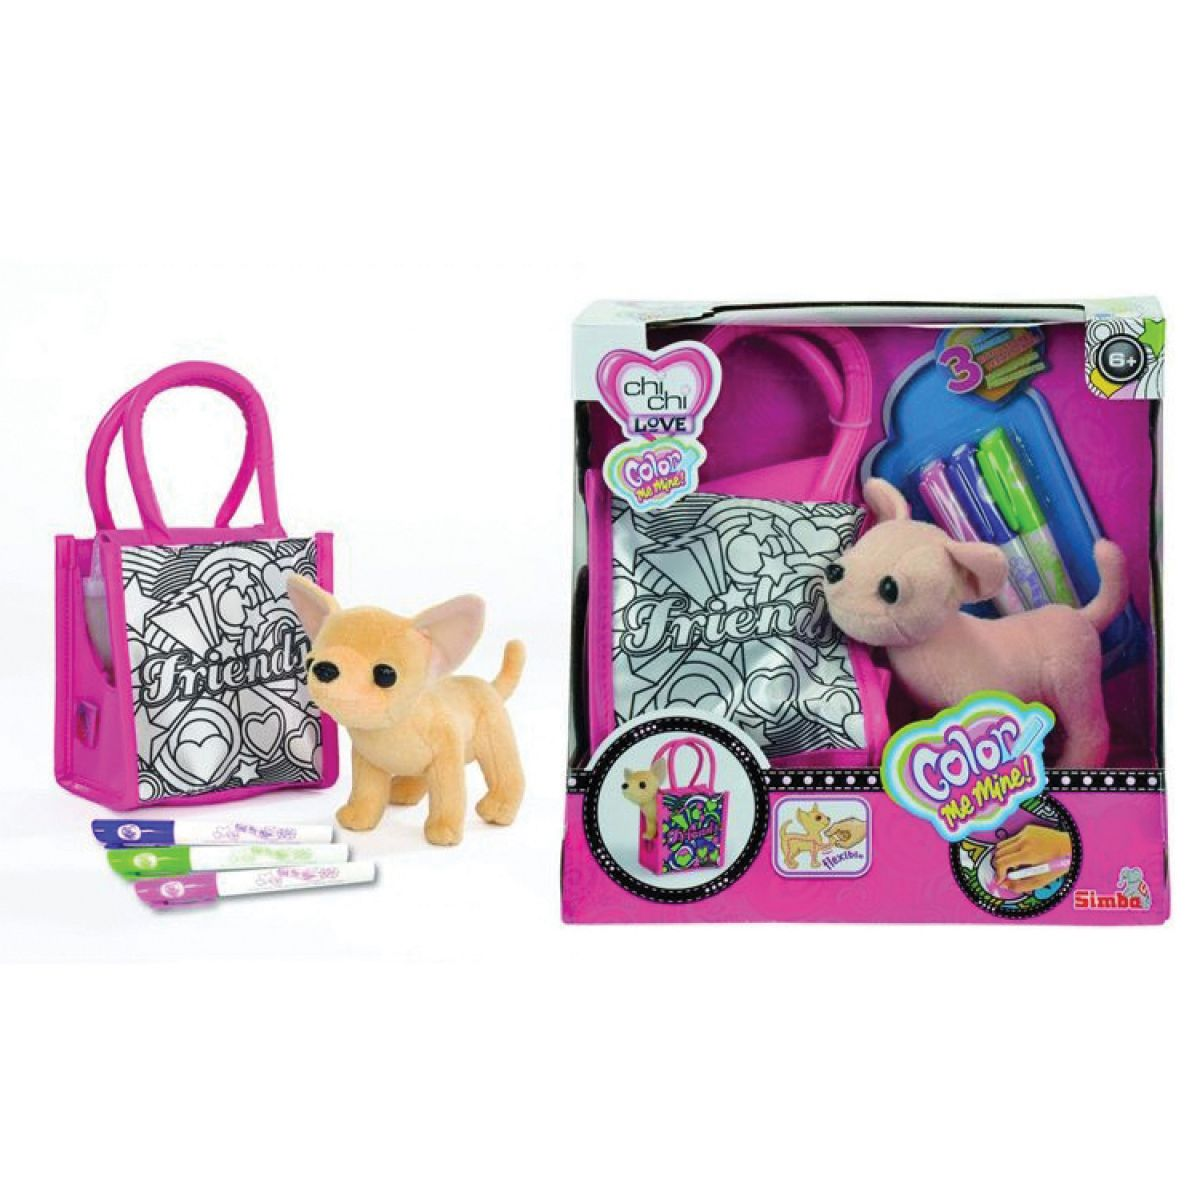 ChiChi Love Pejsek s taškou Color Me Mine II.